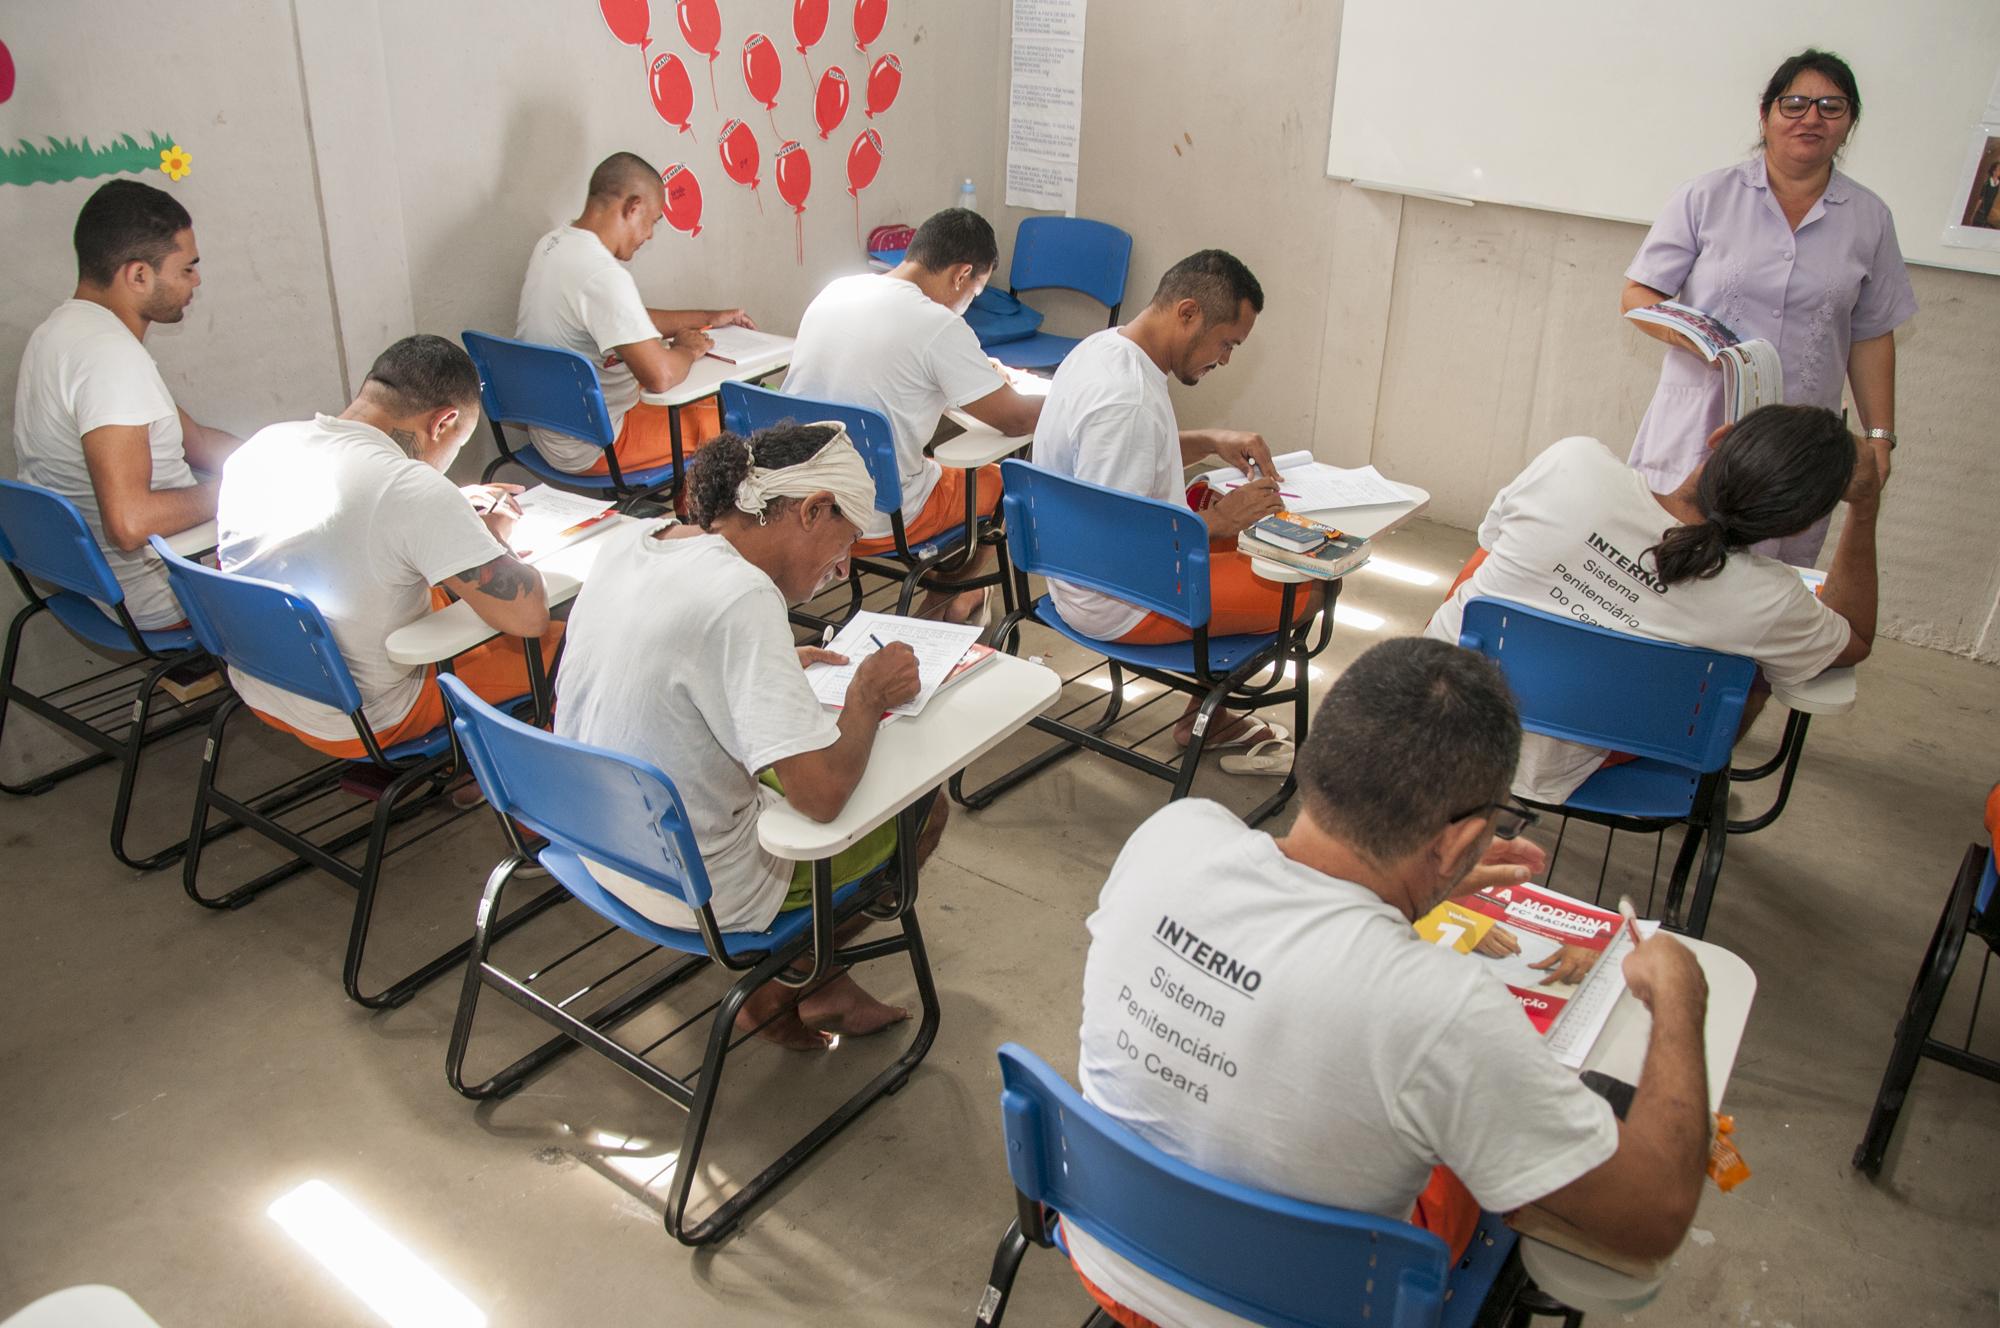 SAP amplia oferta educacional no sistema prisional